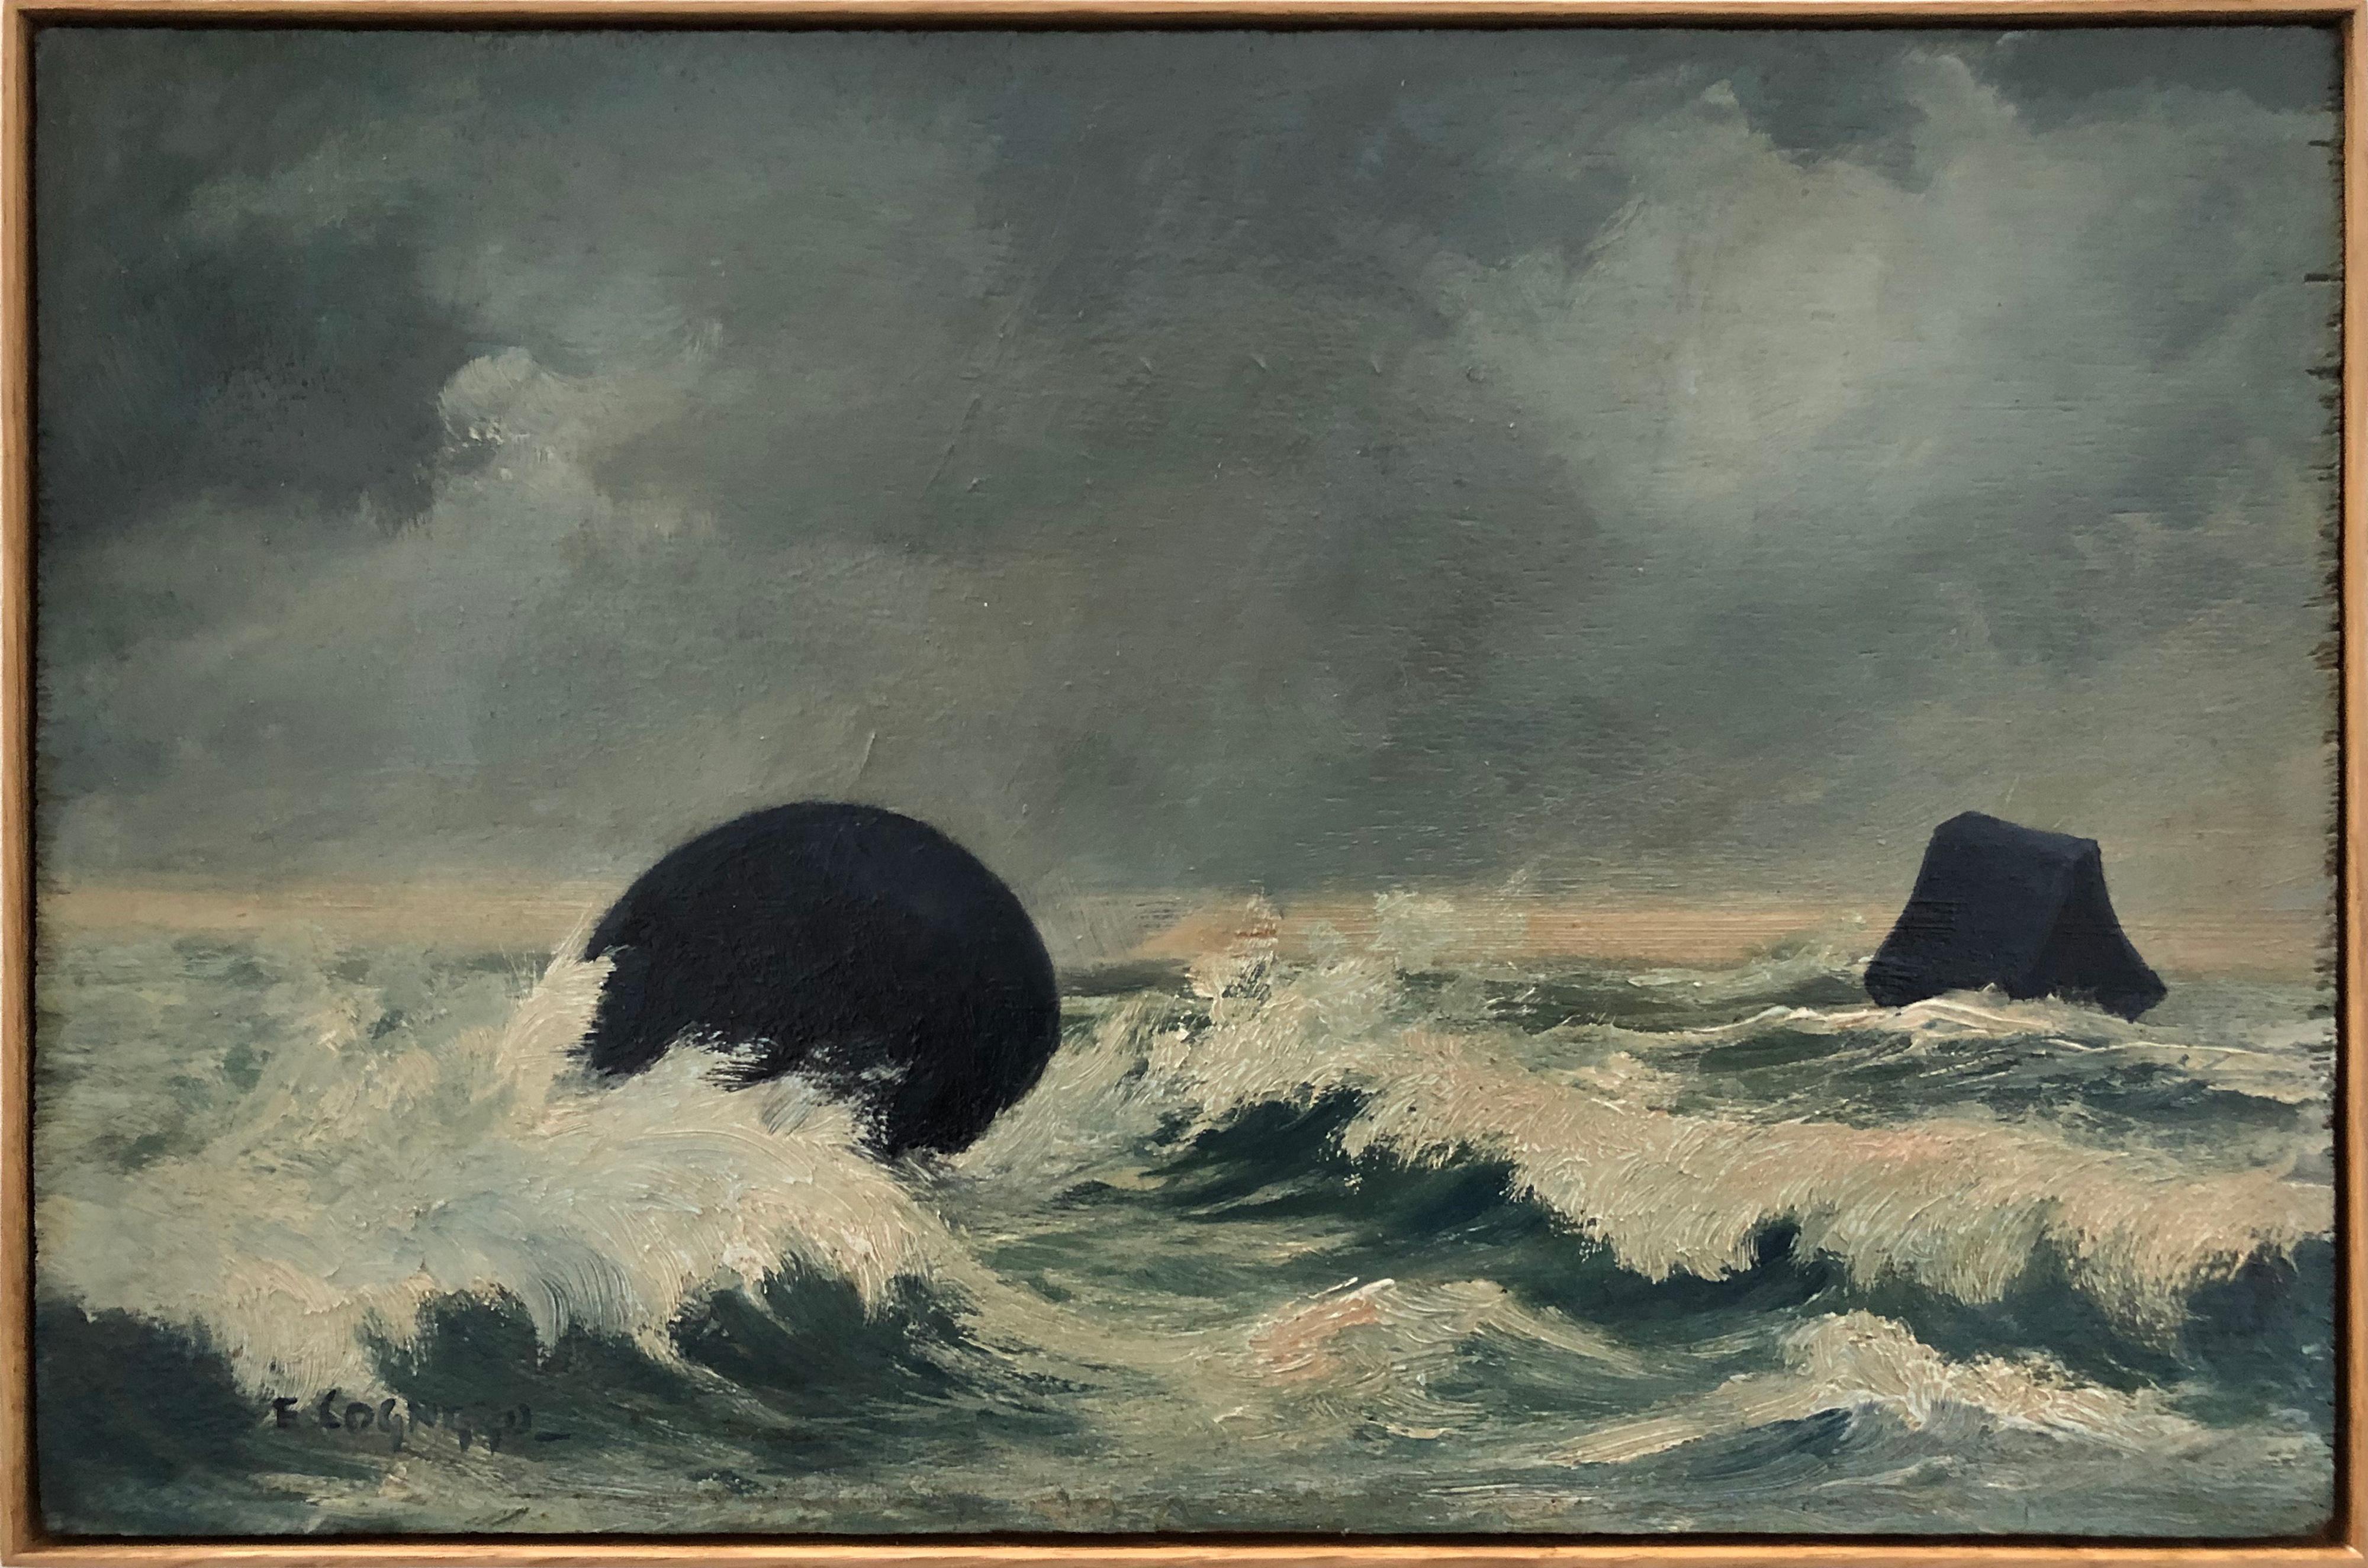 Galerie Barbara Thumm \ Fiona Banner aka The Vanity Press – Full Sea Stop Scape